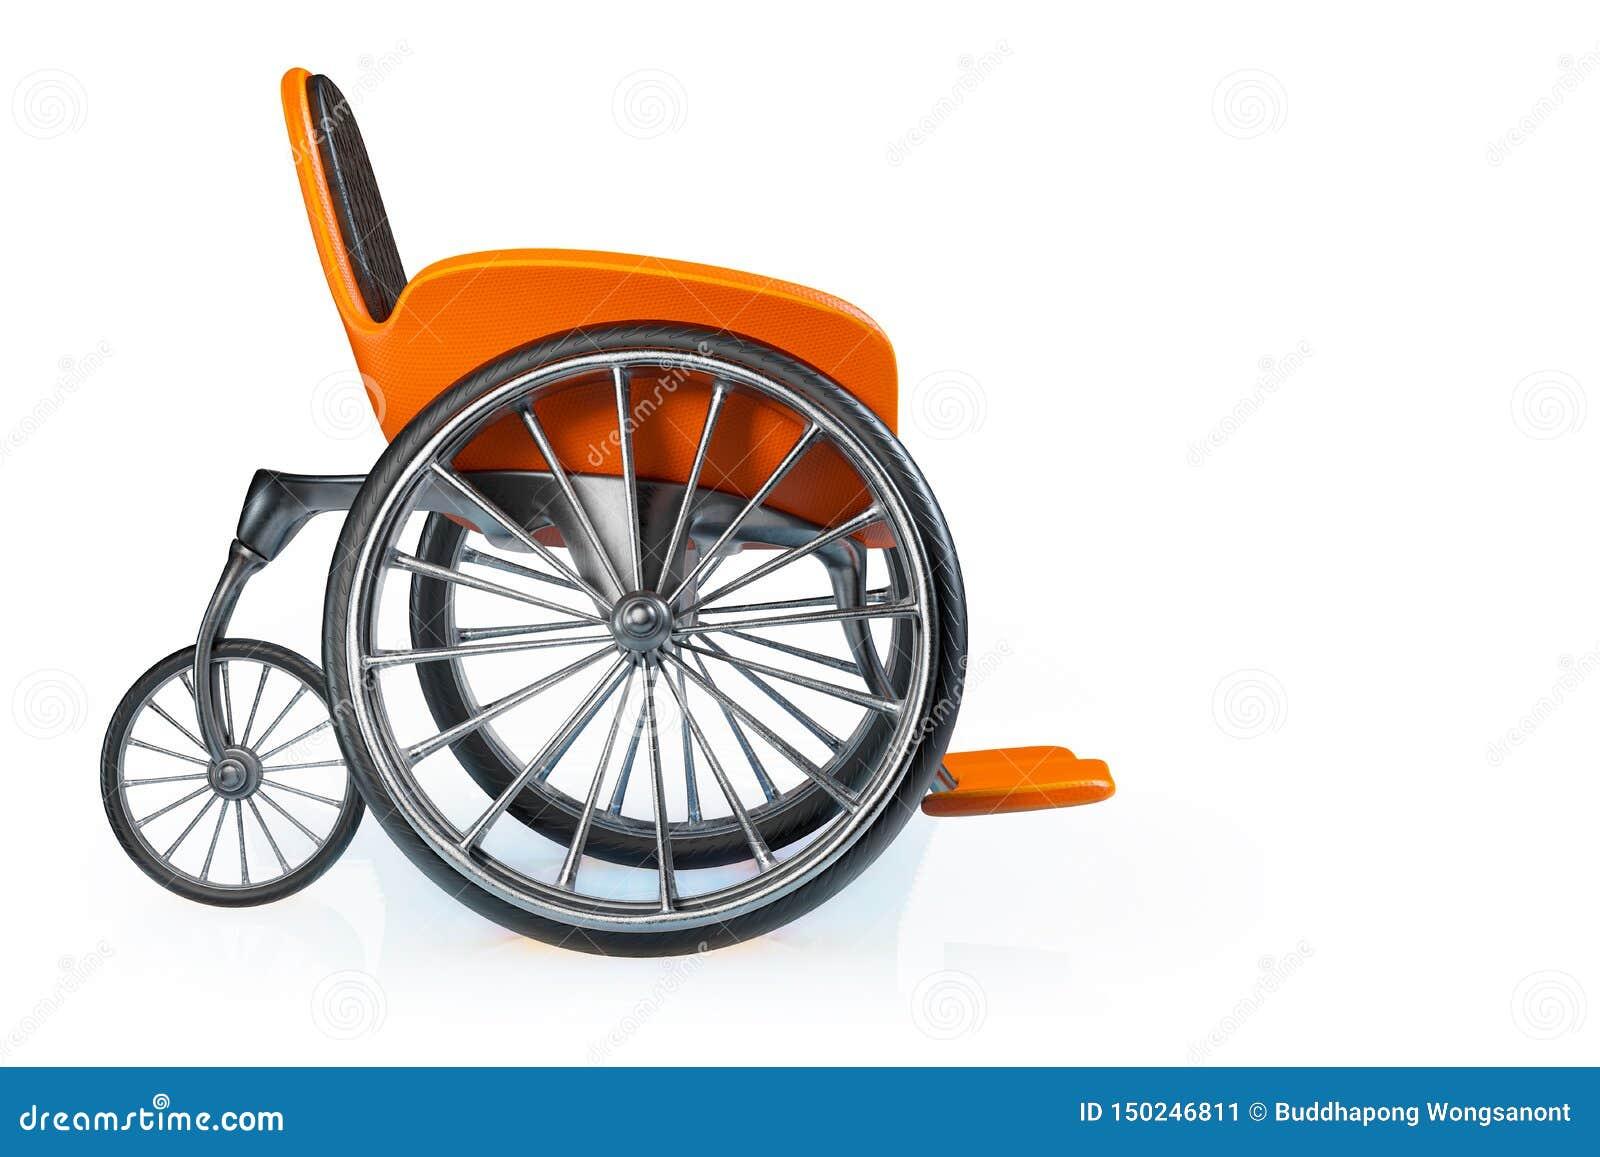 3d que rende a vista lateral da cadeira de rodas moderna alaranjada dos esportes isolada no fundo branco, trajetos de grampeament